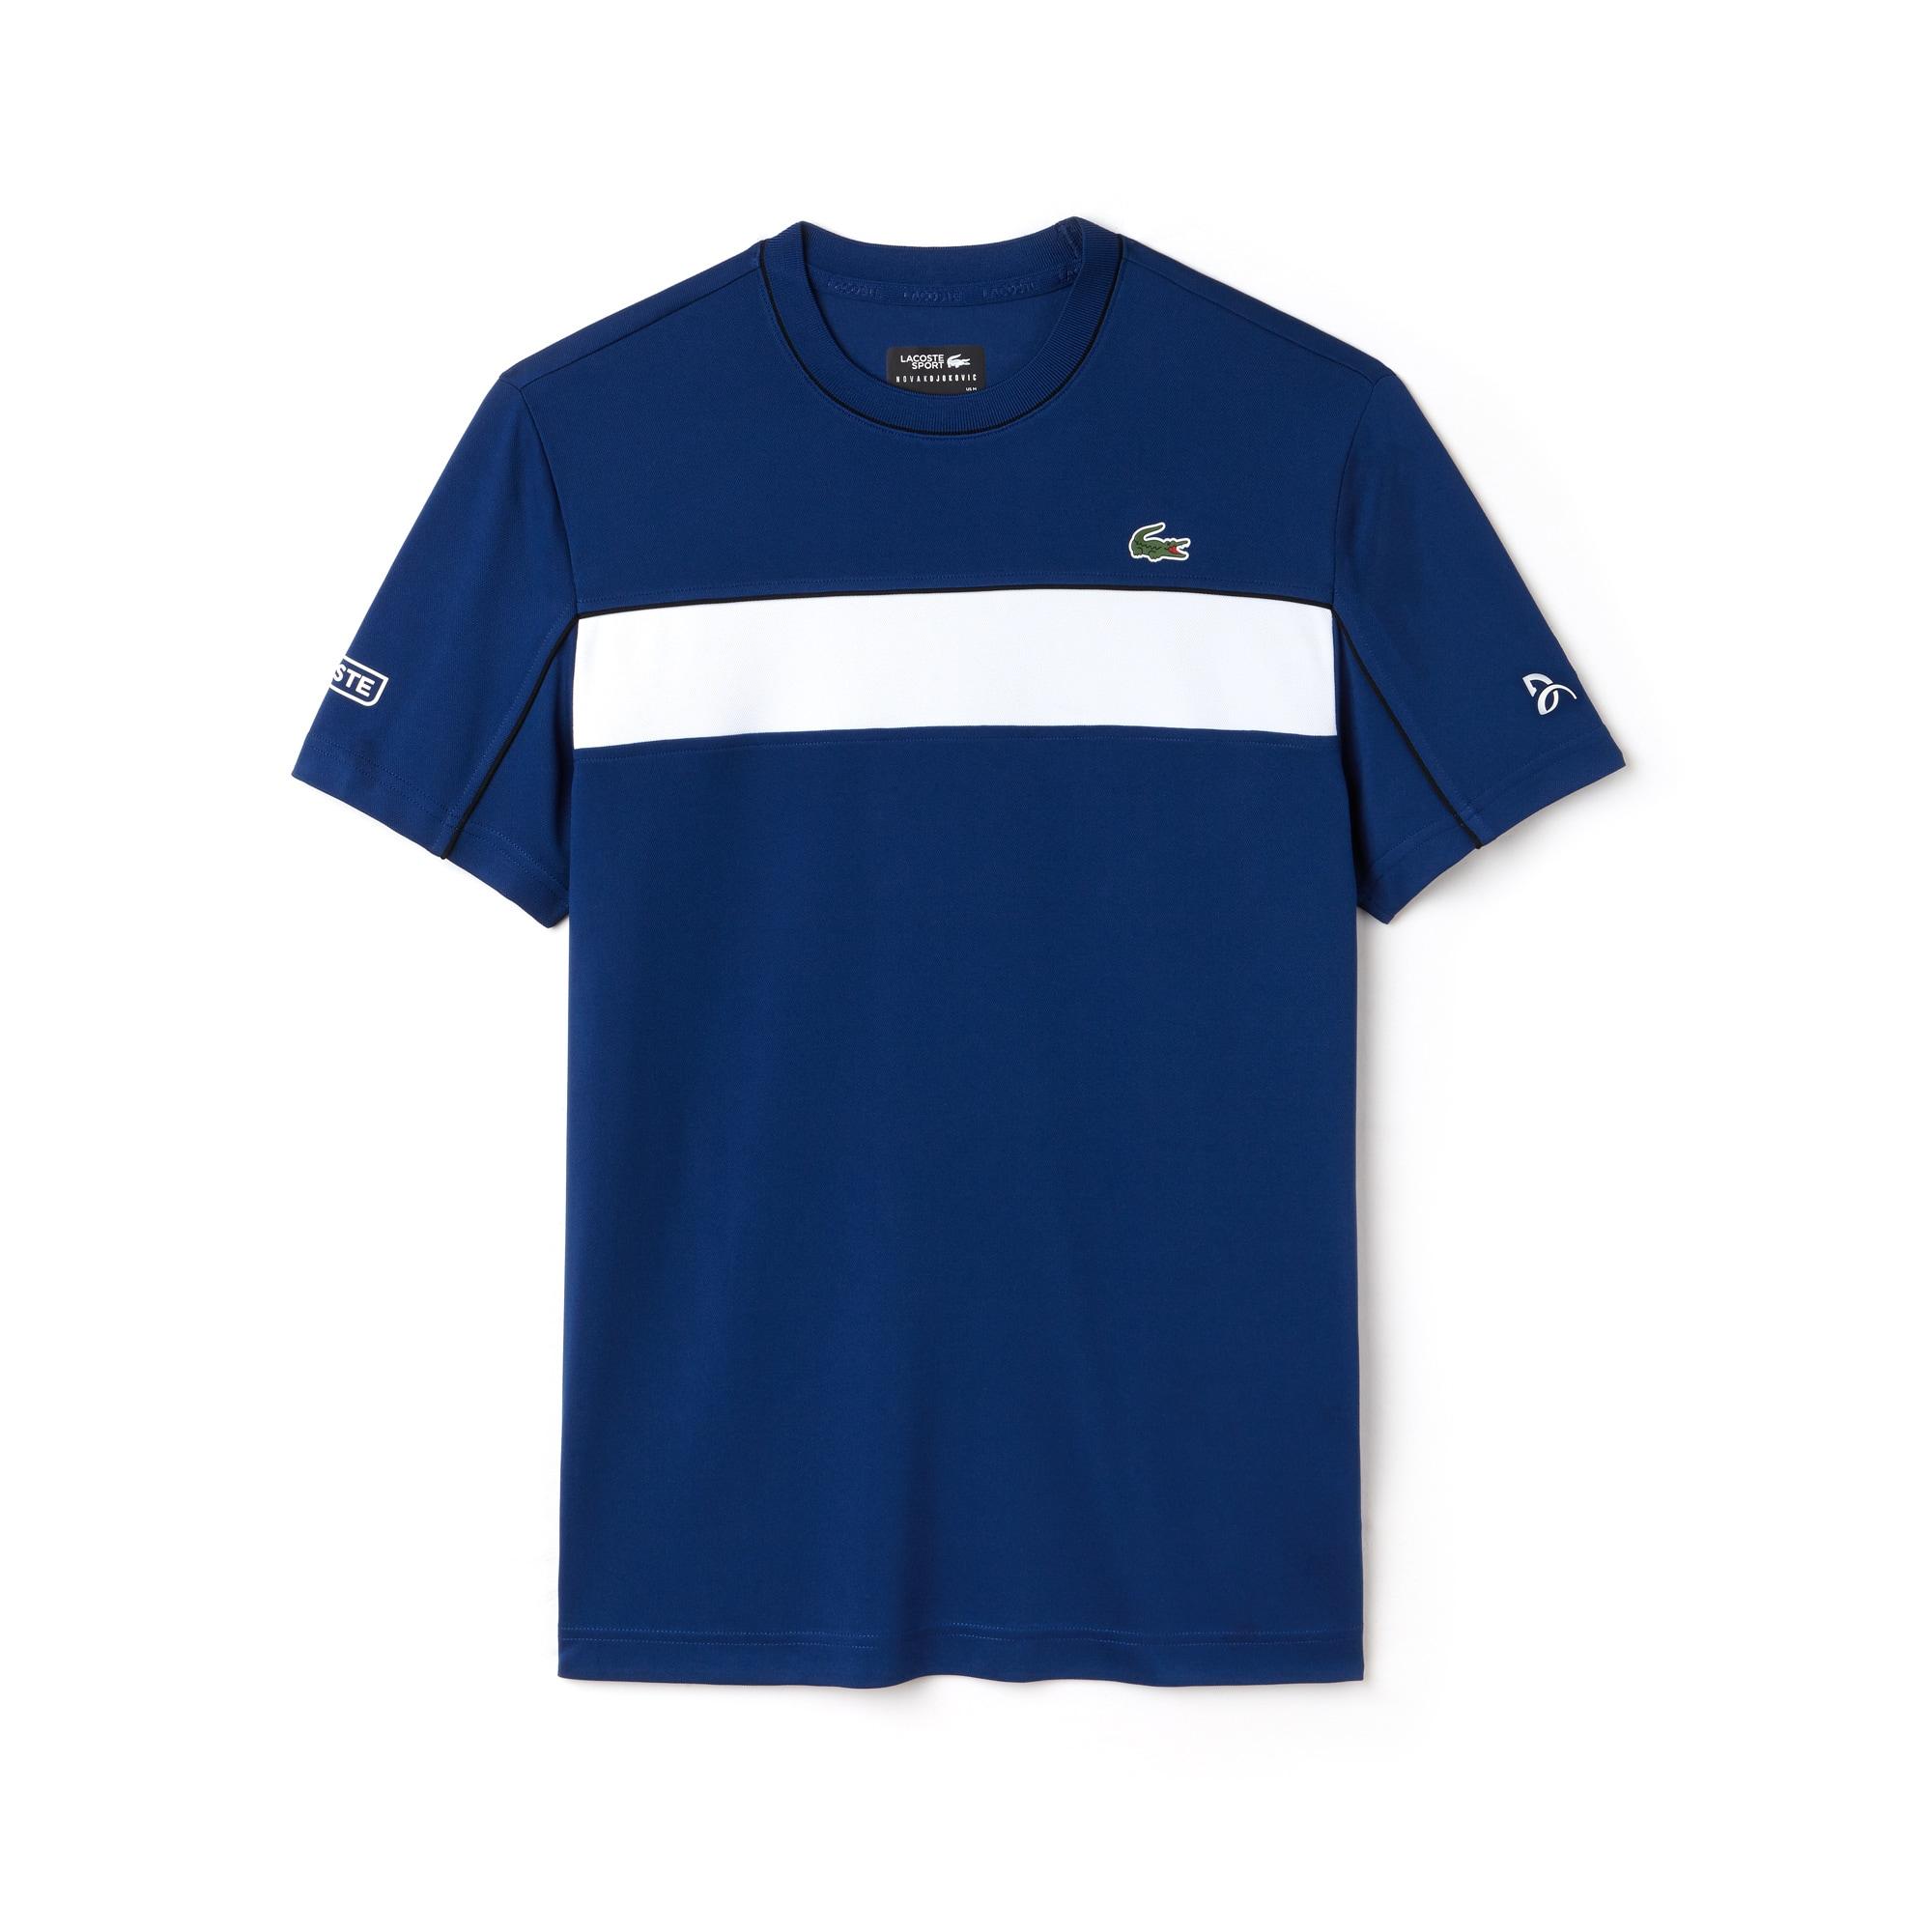 Herren LACOSTE SPORT NOVAK DJOKOVIC COLLECTION T-Shirt